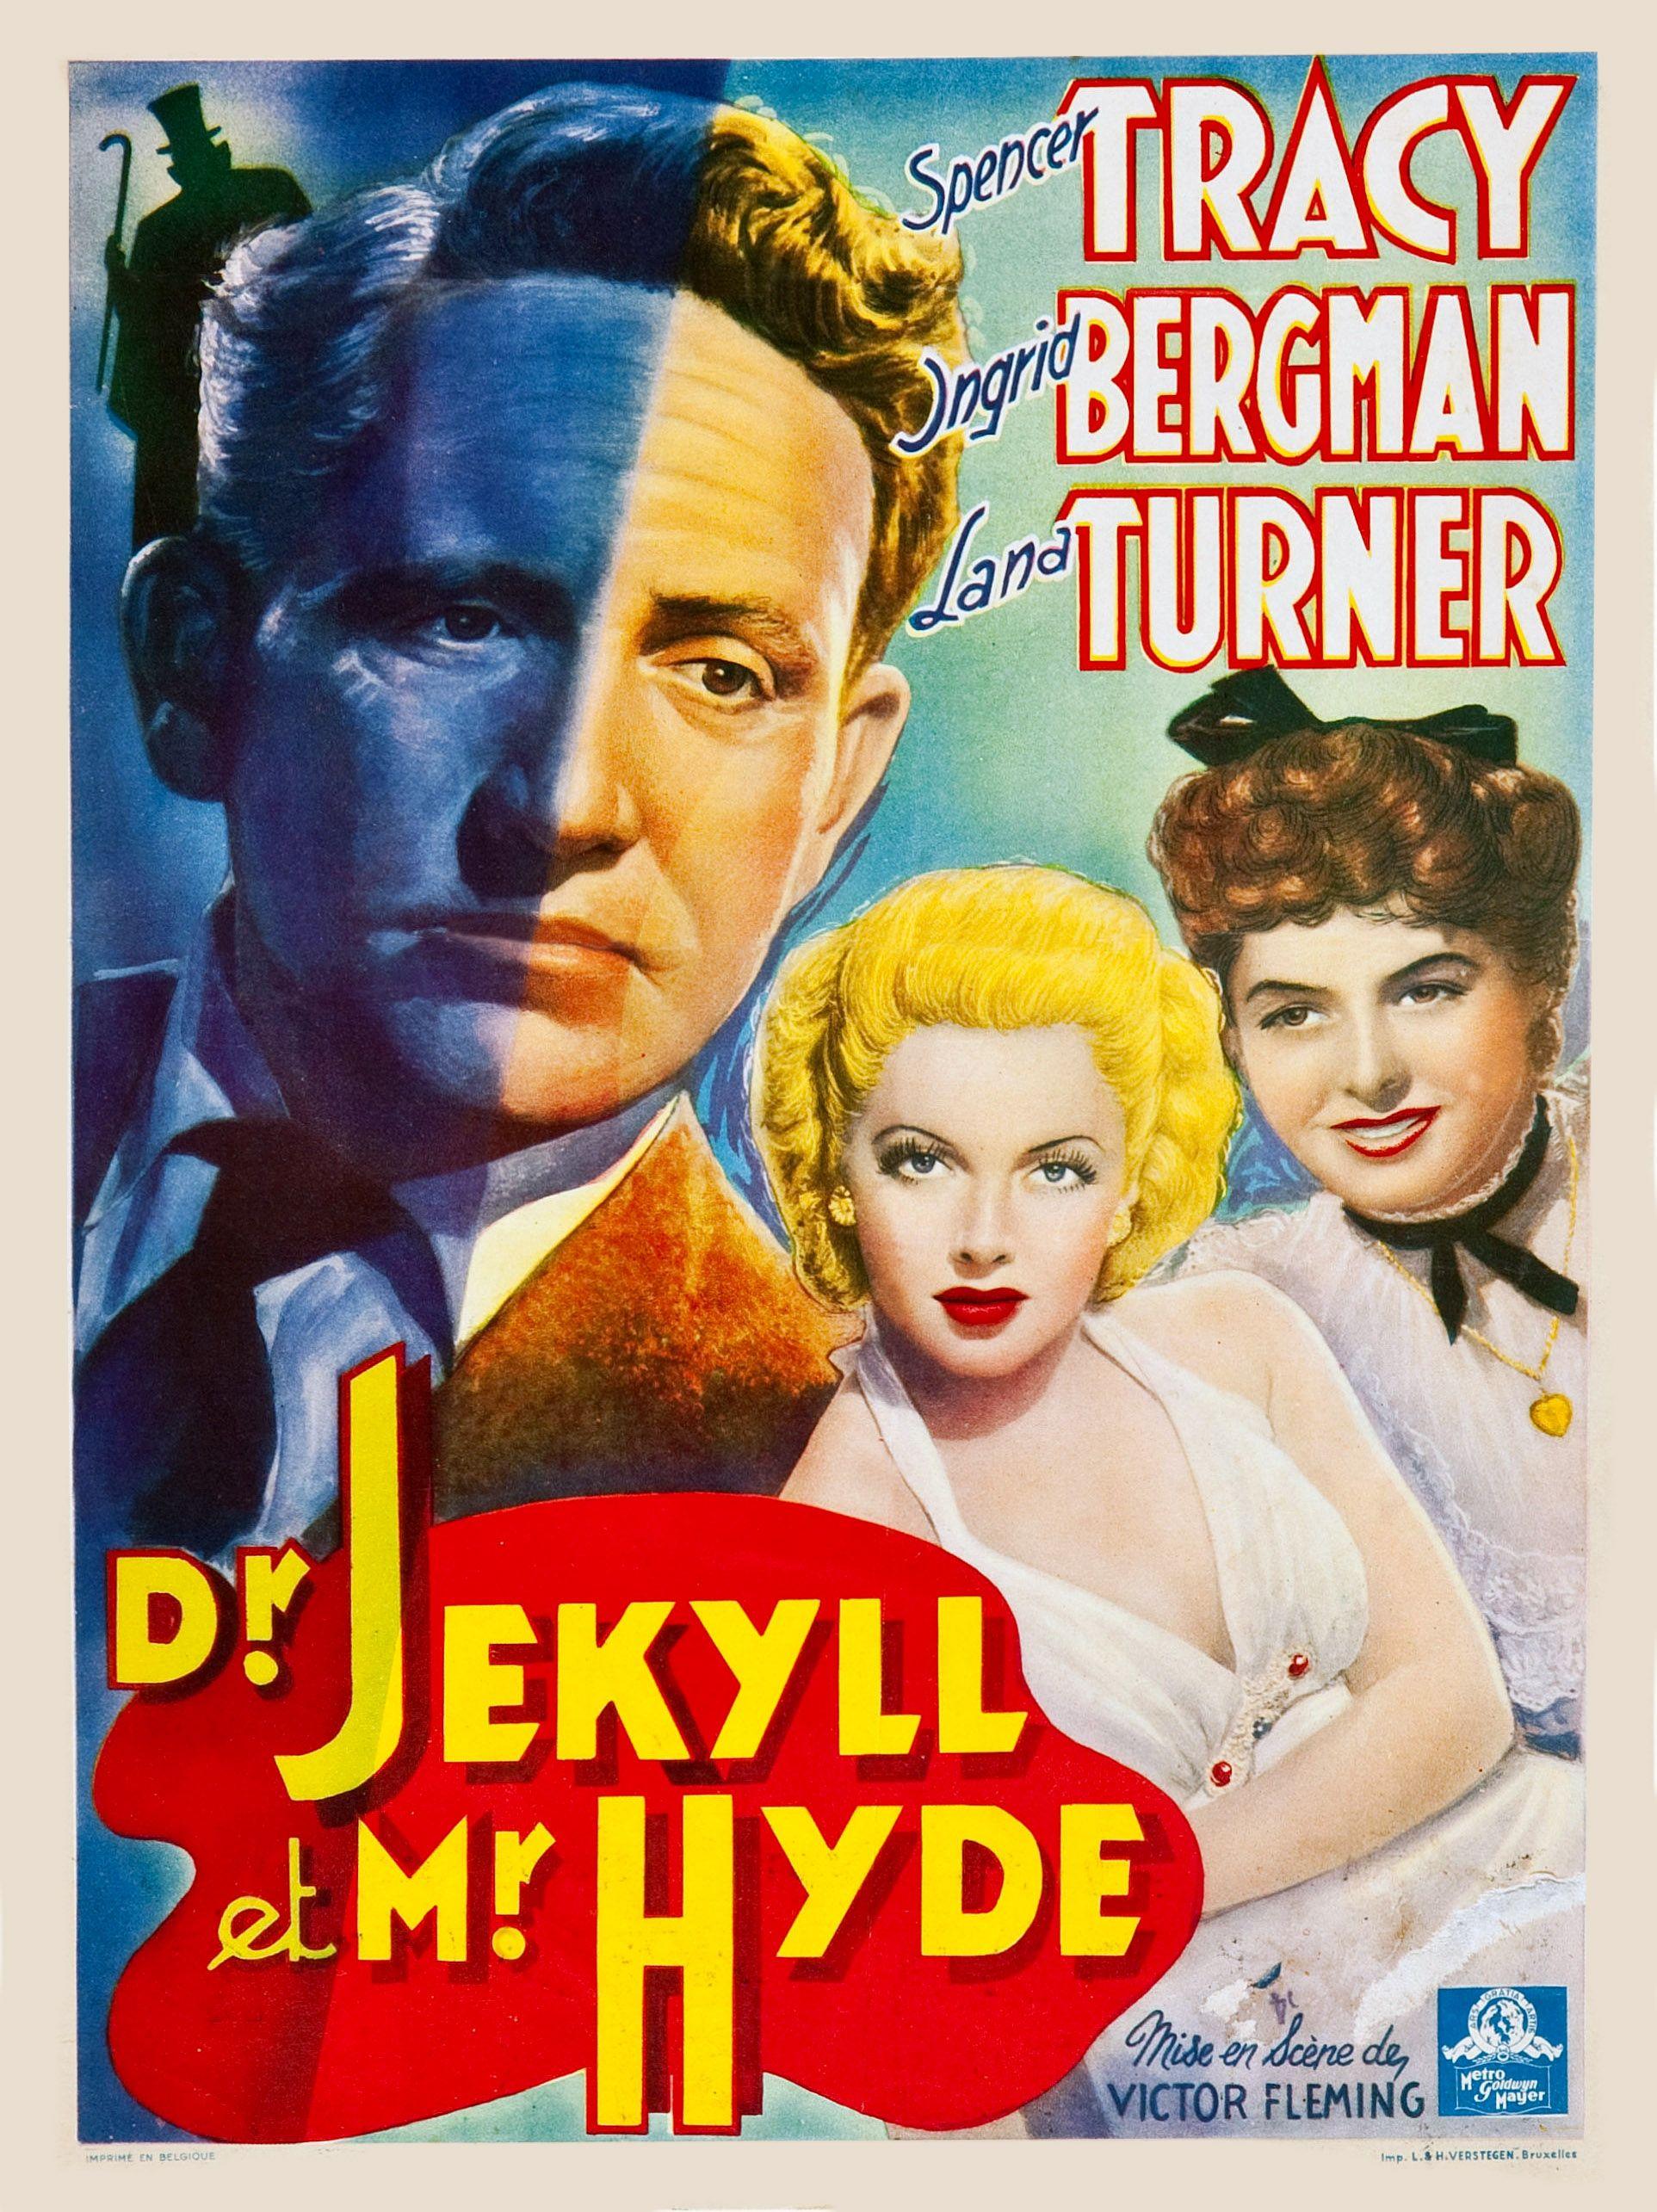 Dr Jekyll /& Mr Hyde Lana Turner vintage movie poster